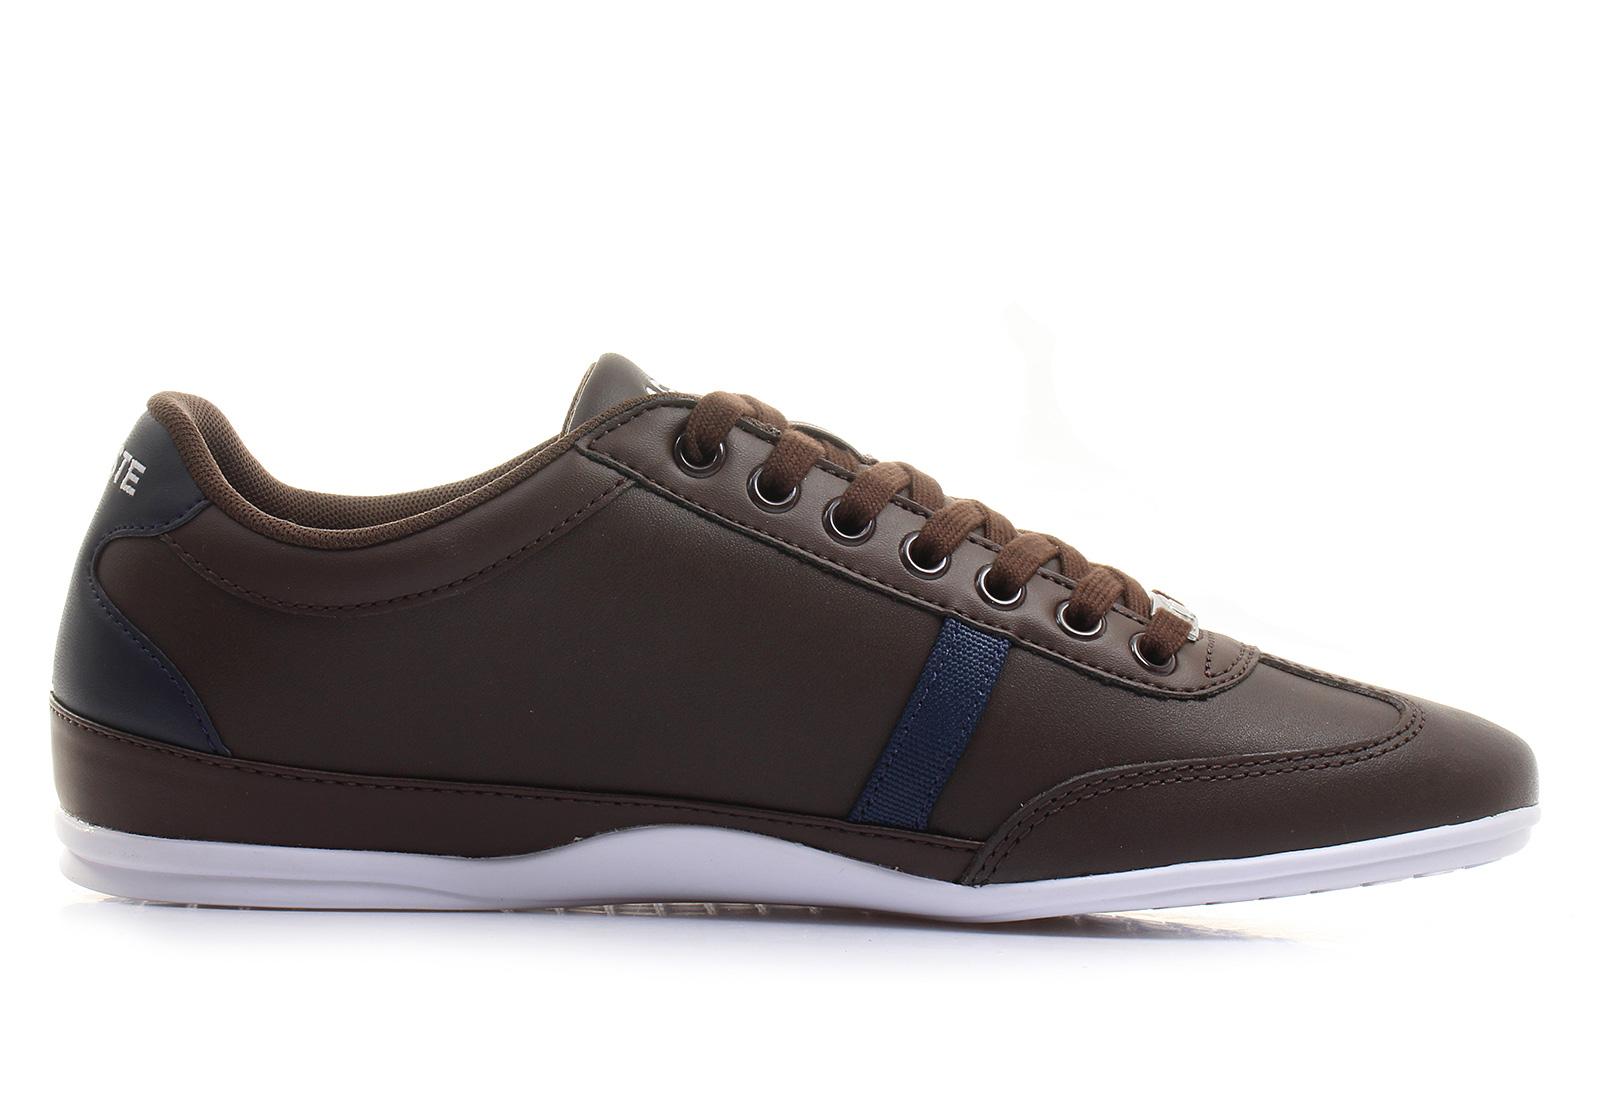 lacoste shoes misano sport 151spm0040 2j6